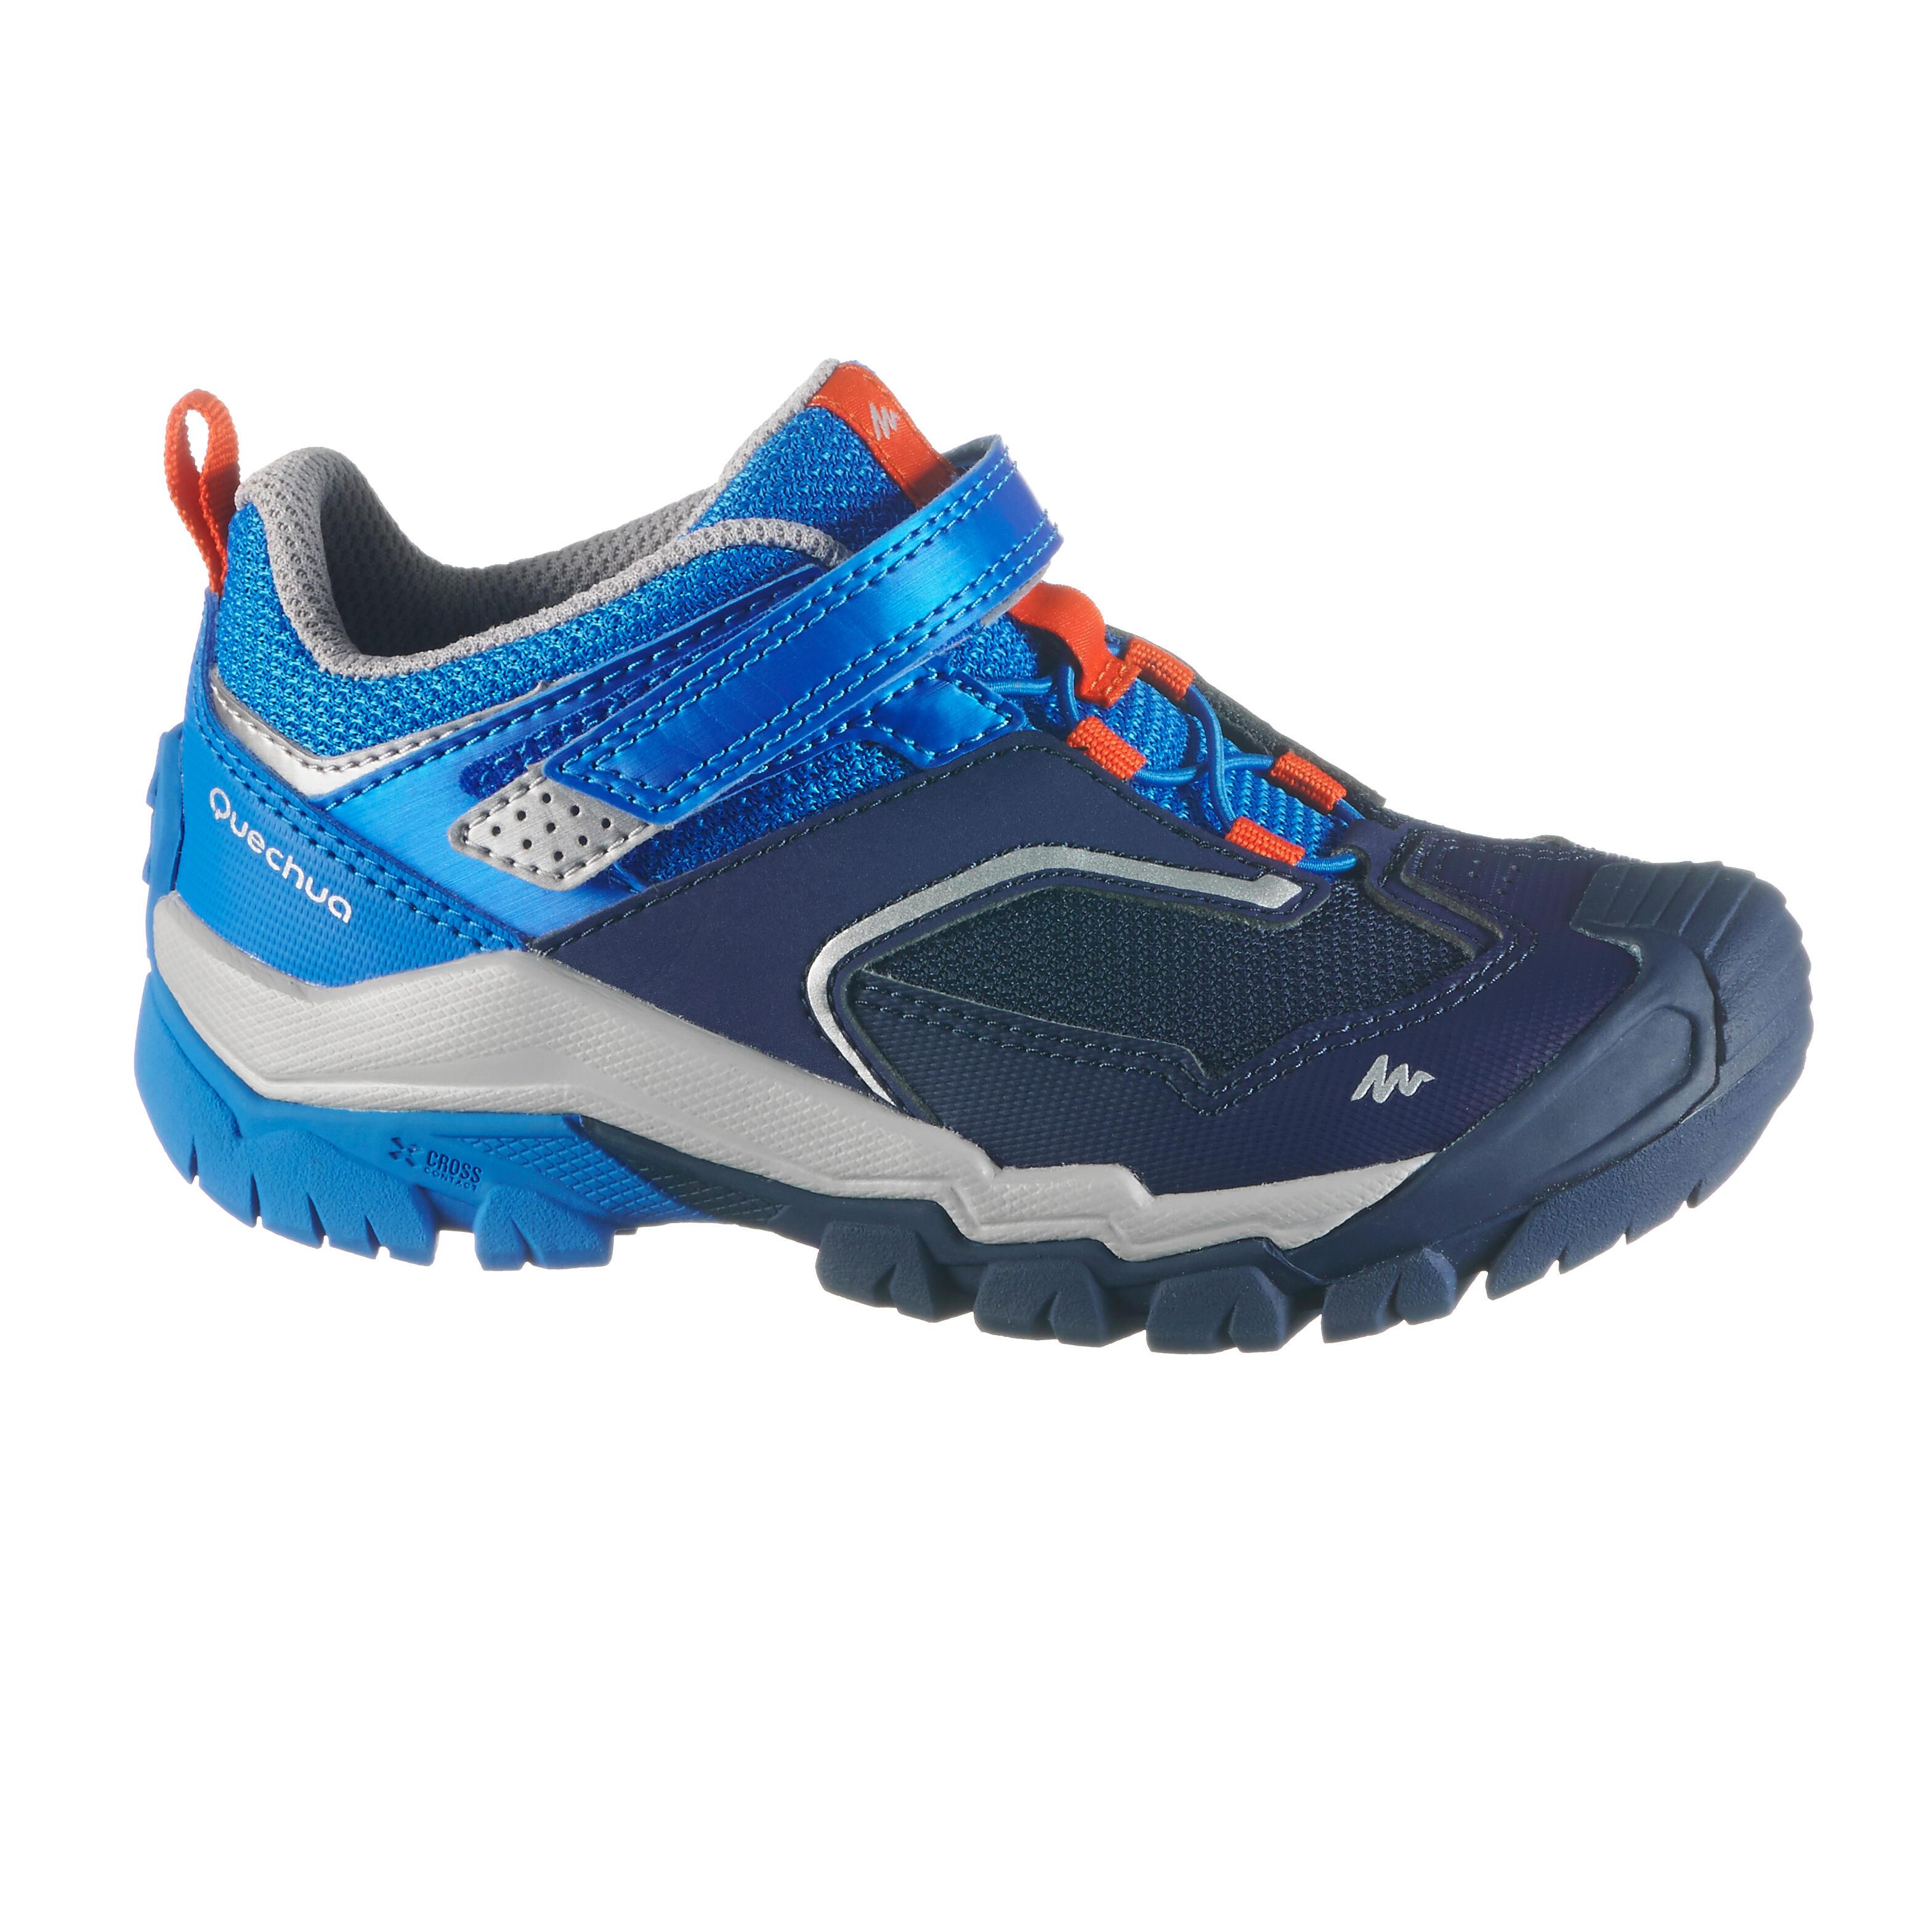 Chaussures de randonnée montagne basses avec scratch garçon crossrock kid bleues quechua